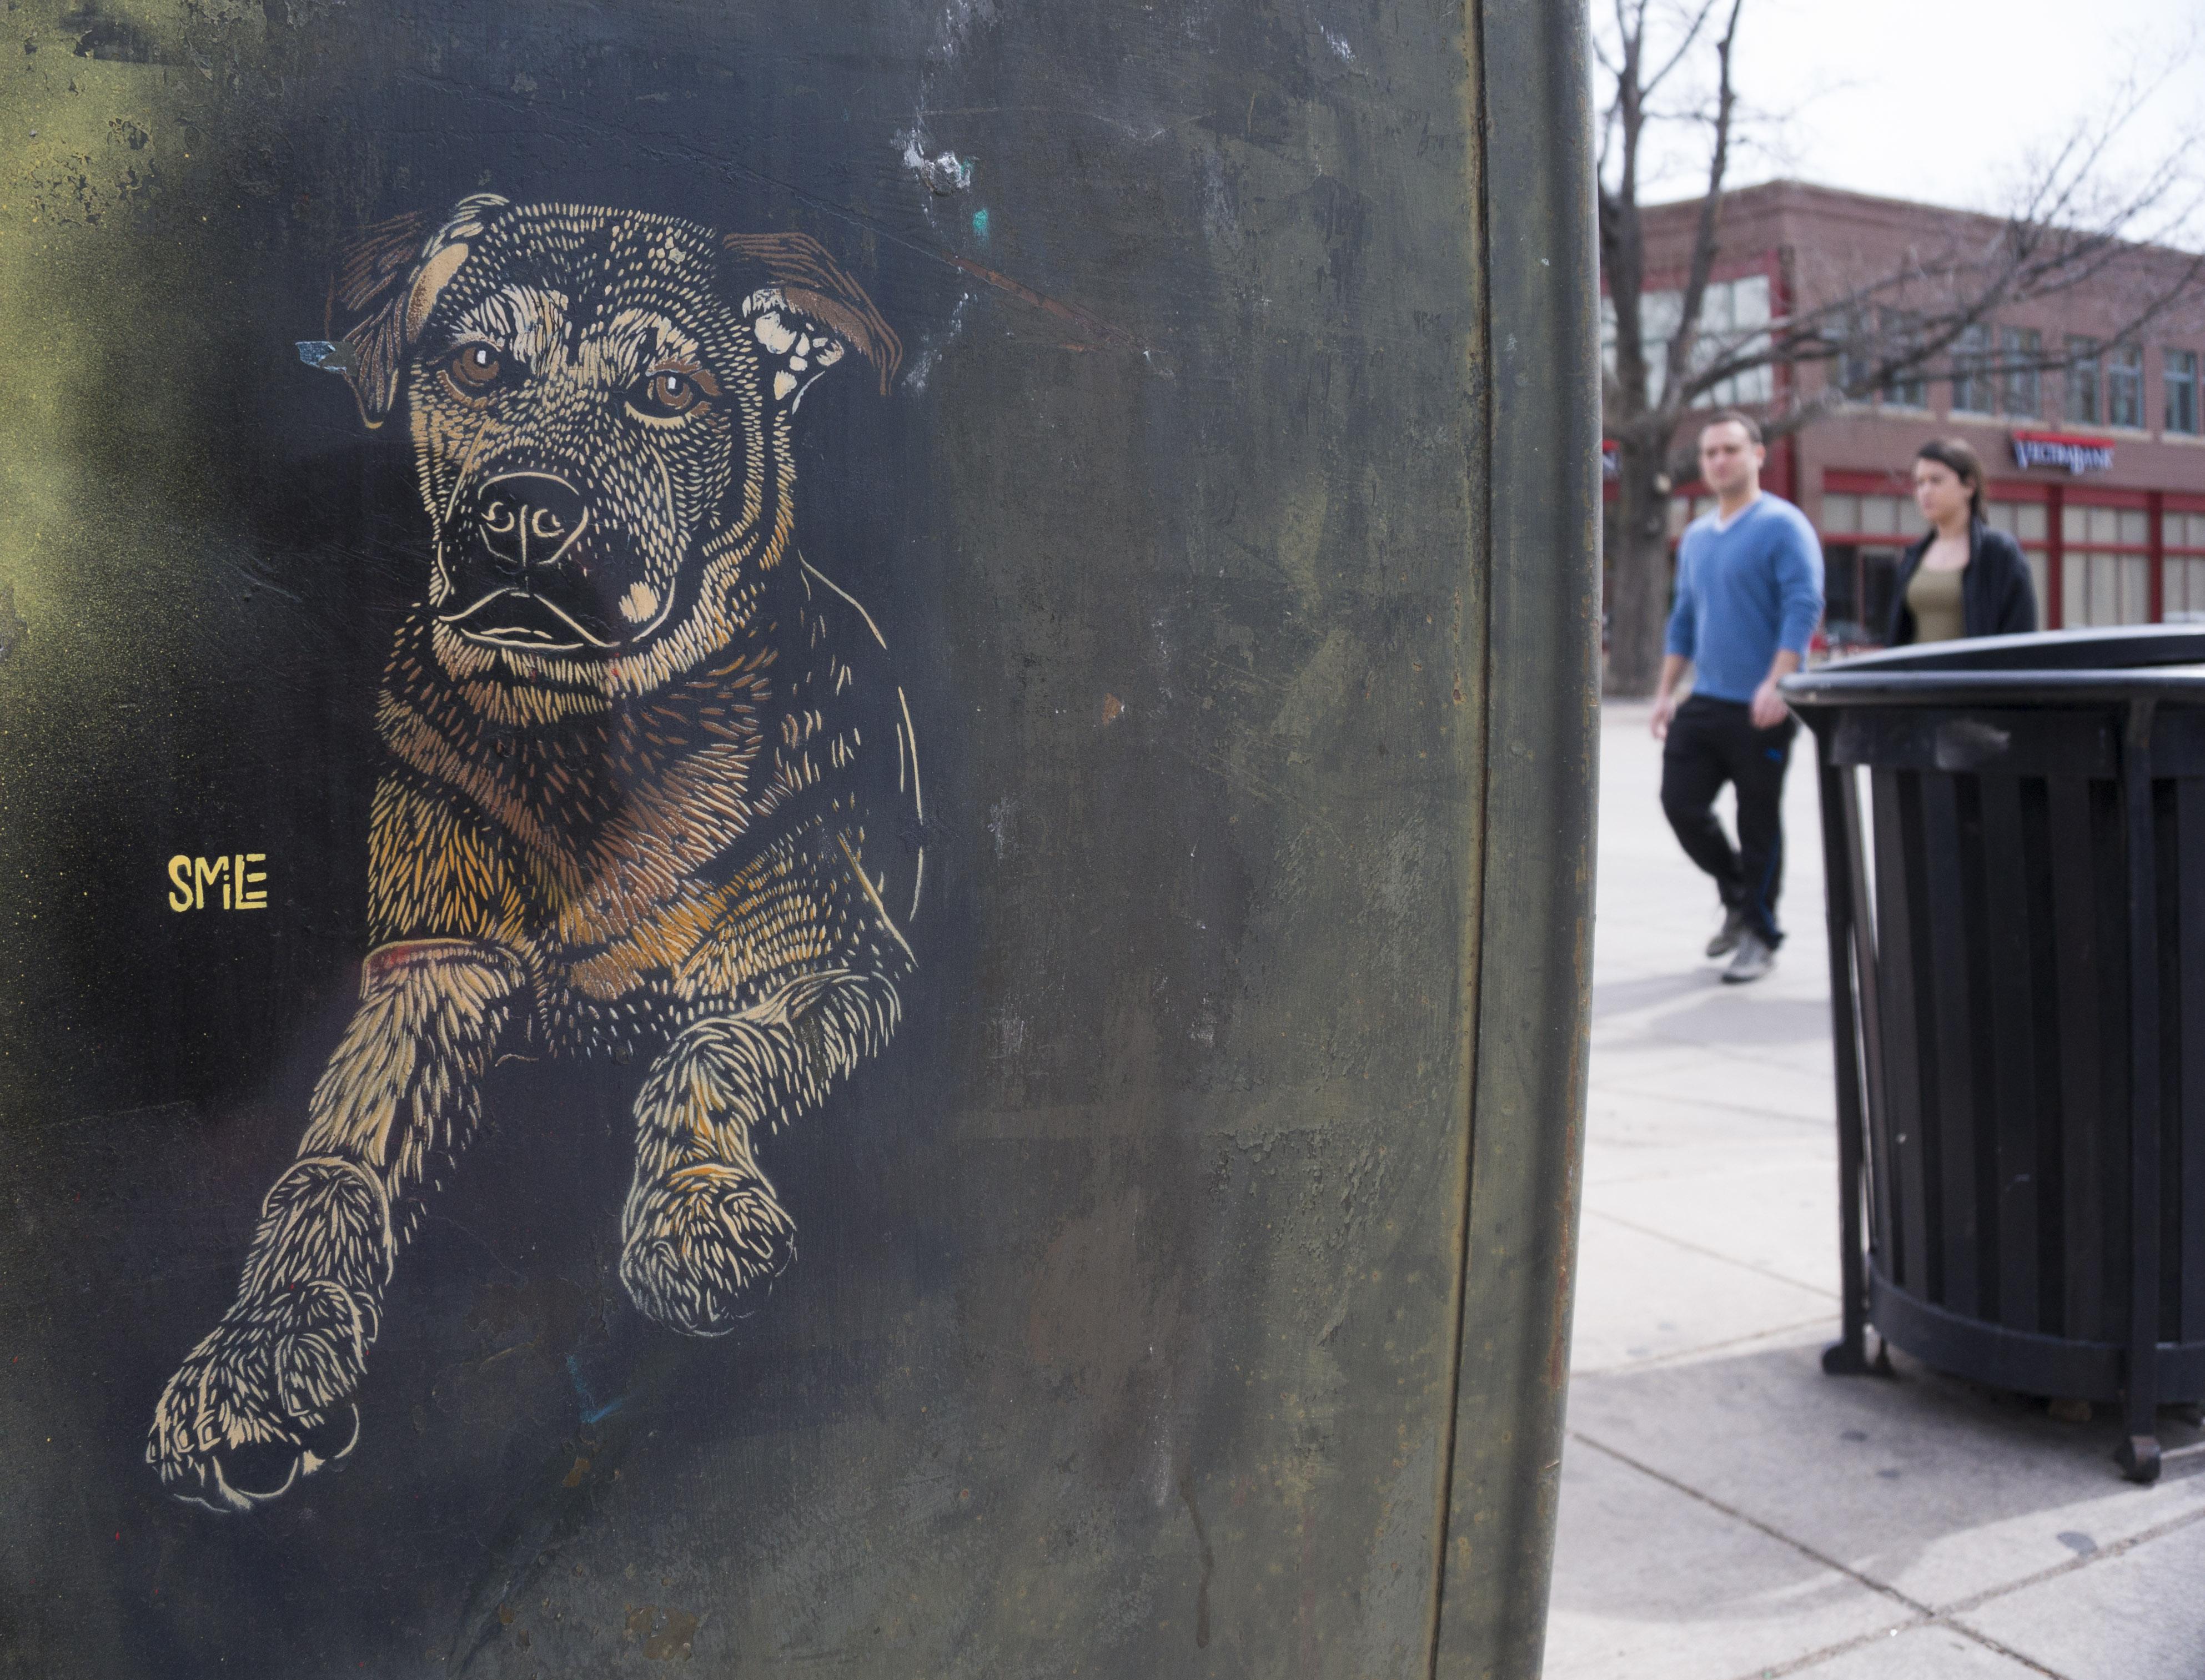 Photo: SMiLE artwork, Dog Image, Pearl Street